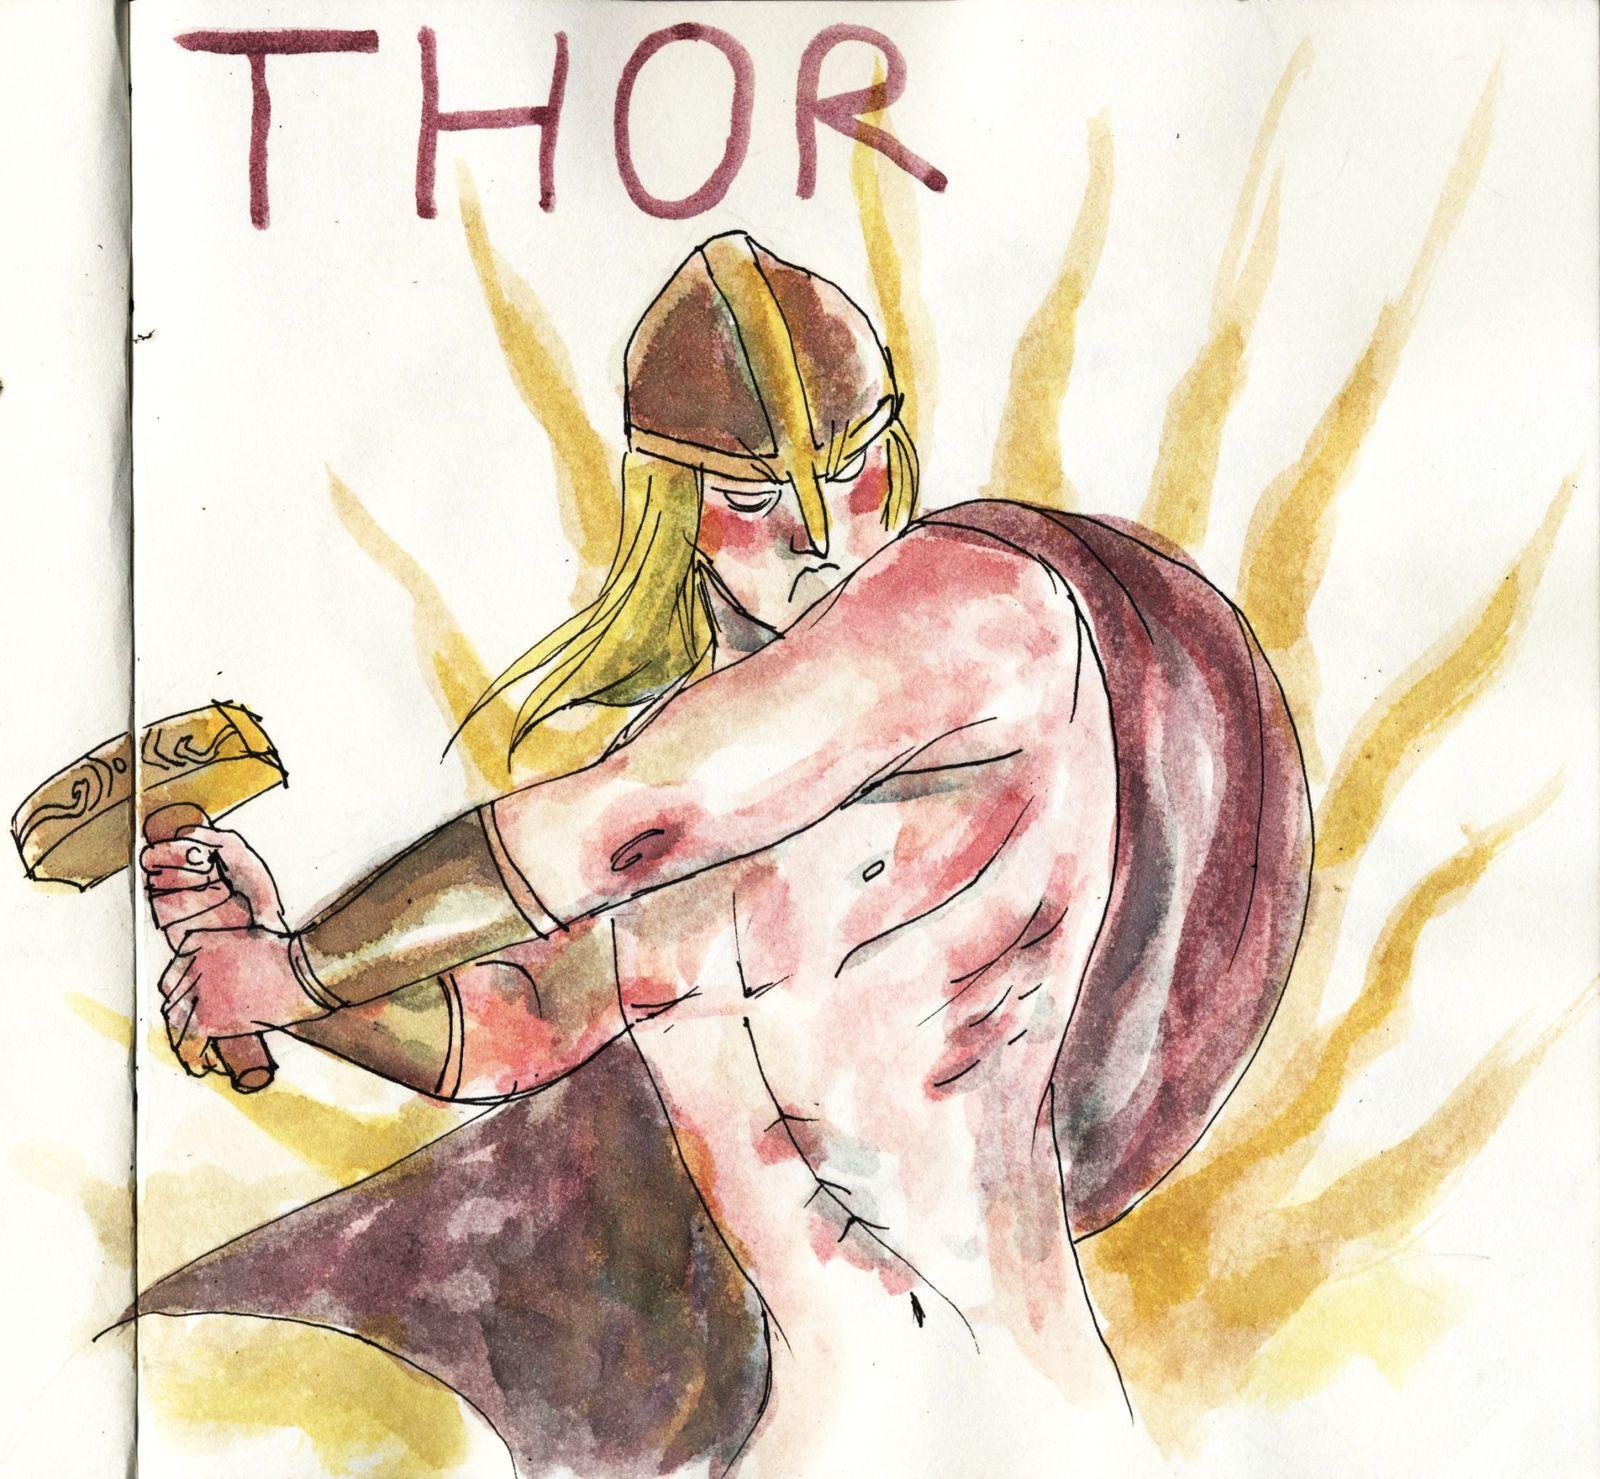 dieu.thor